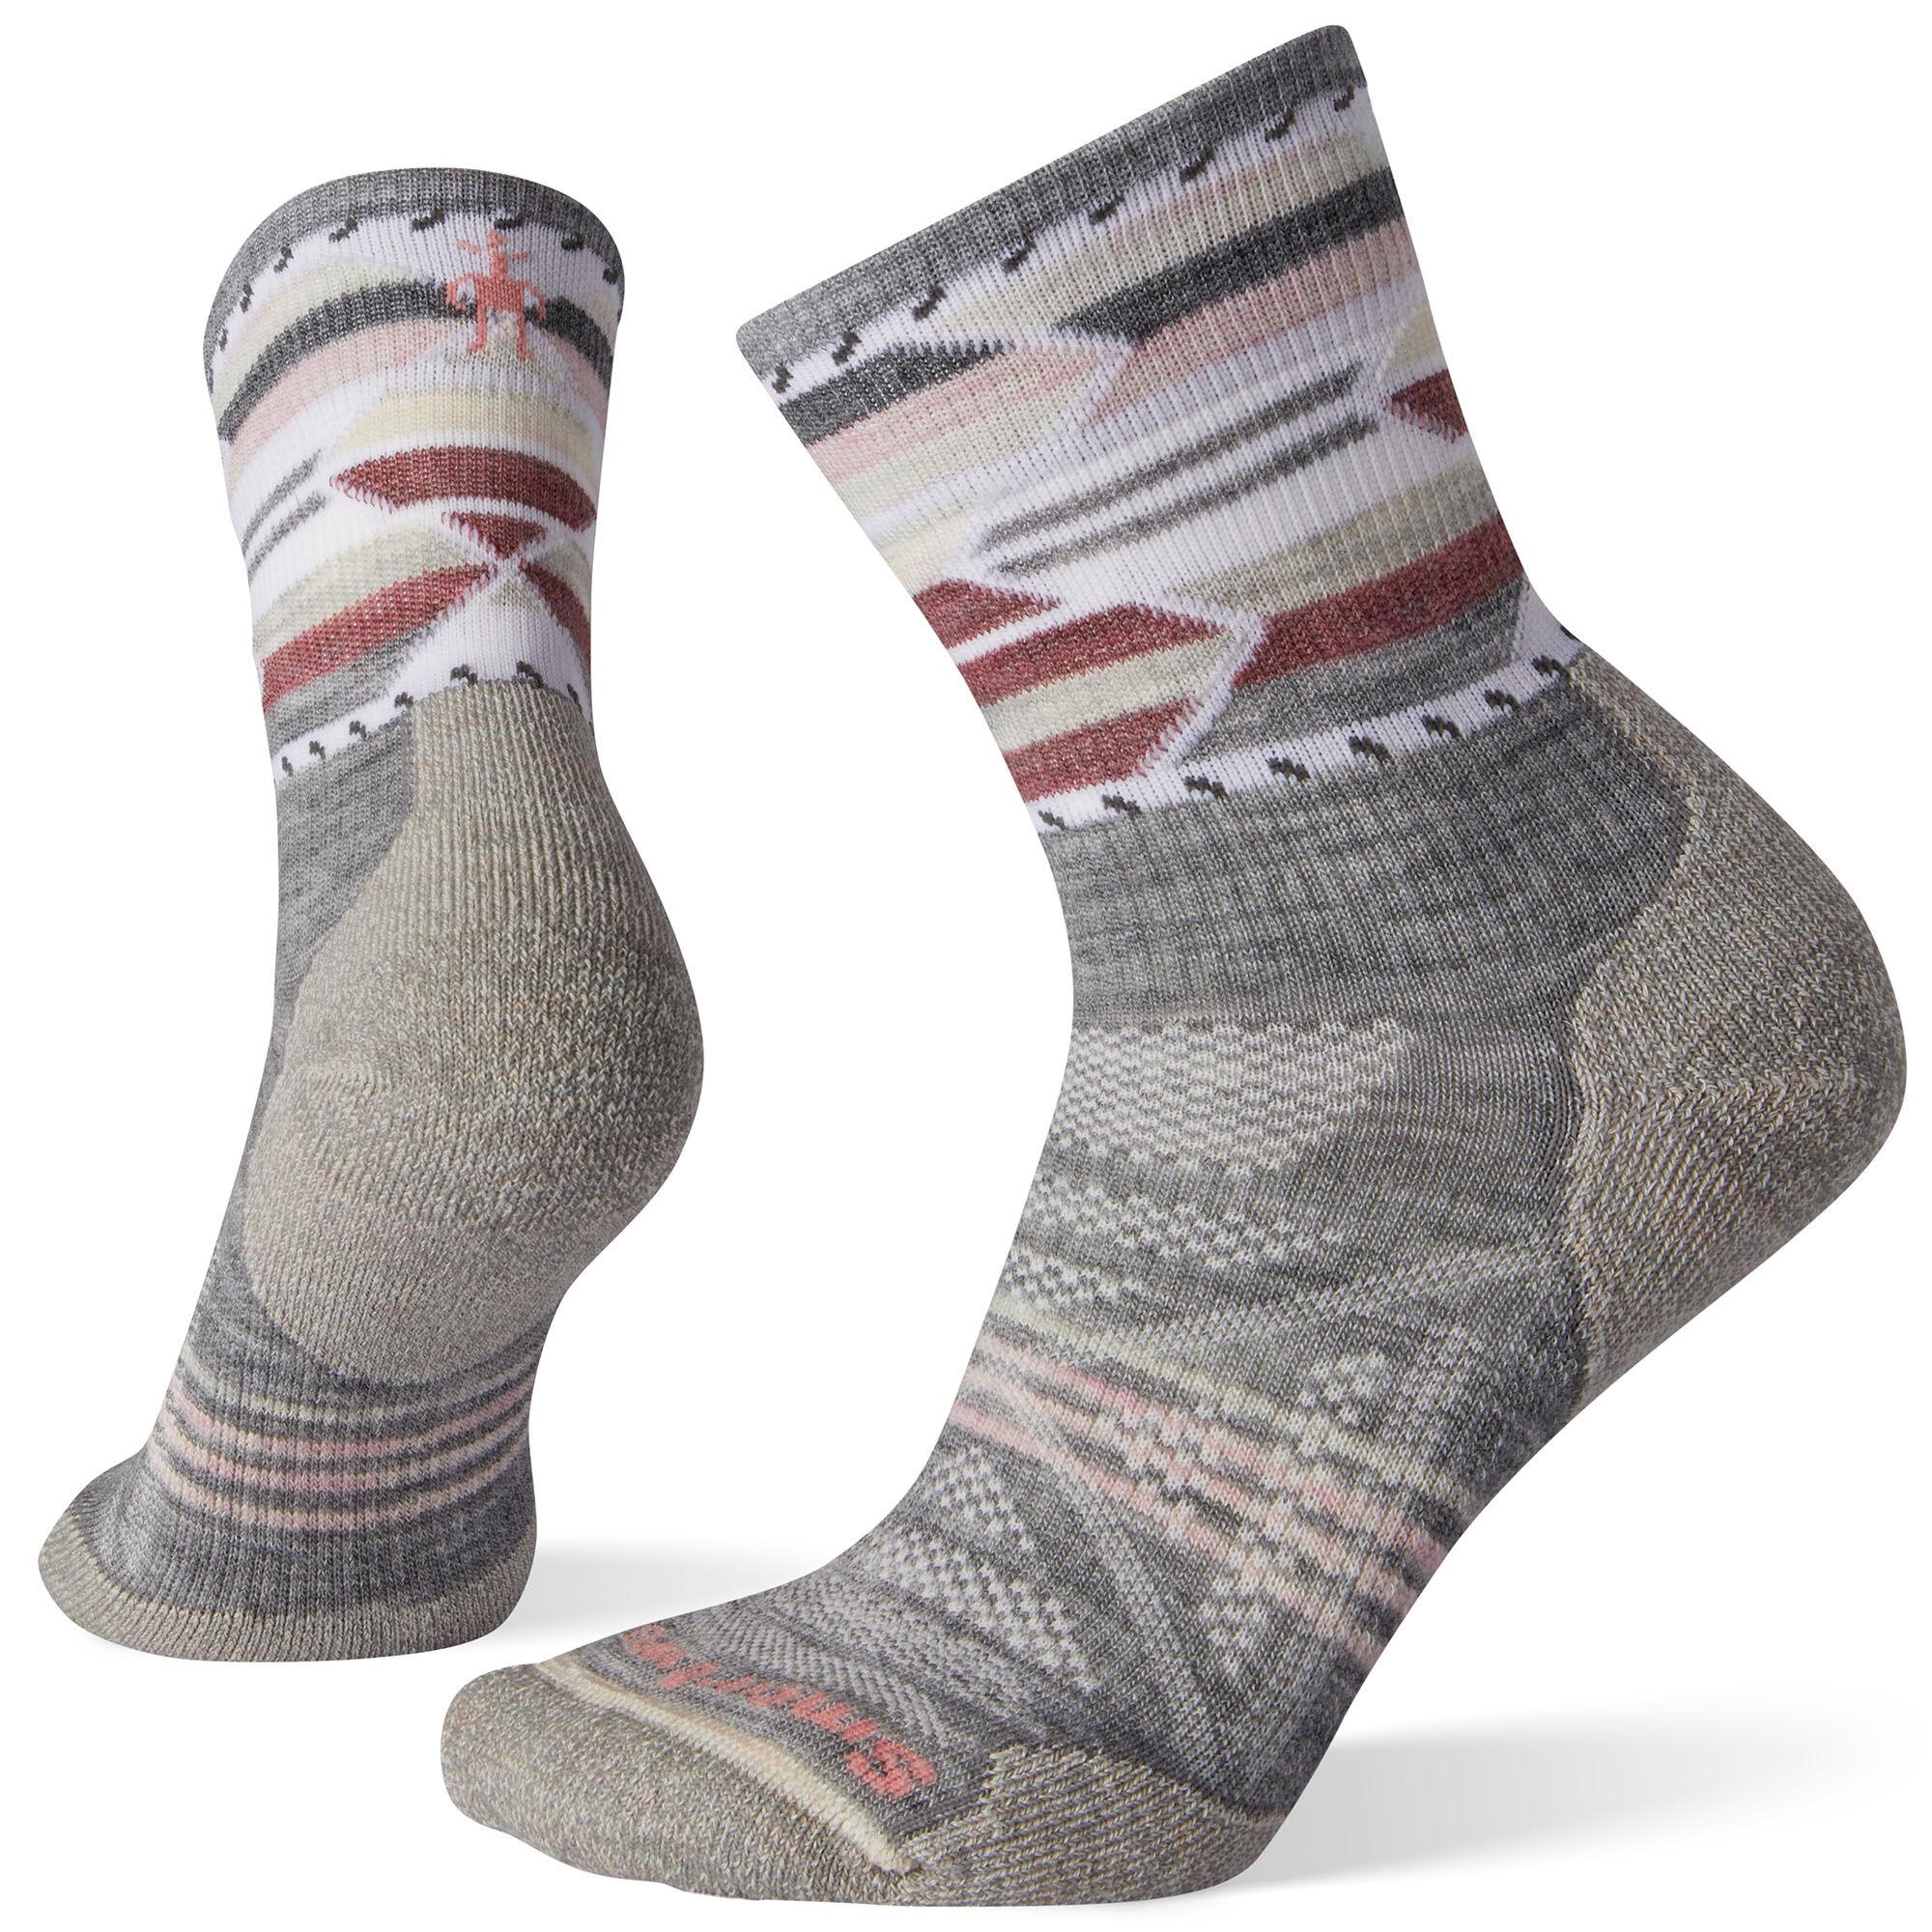 Smartwool Women's PhD Outdoor Light Pattern Mid Crew Hiking Socks  - Light Gray - Size: Small